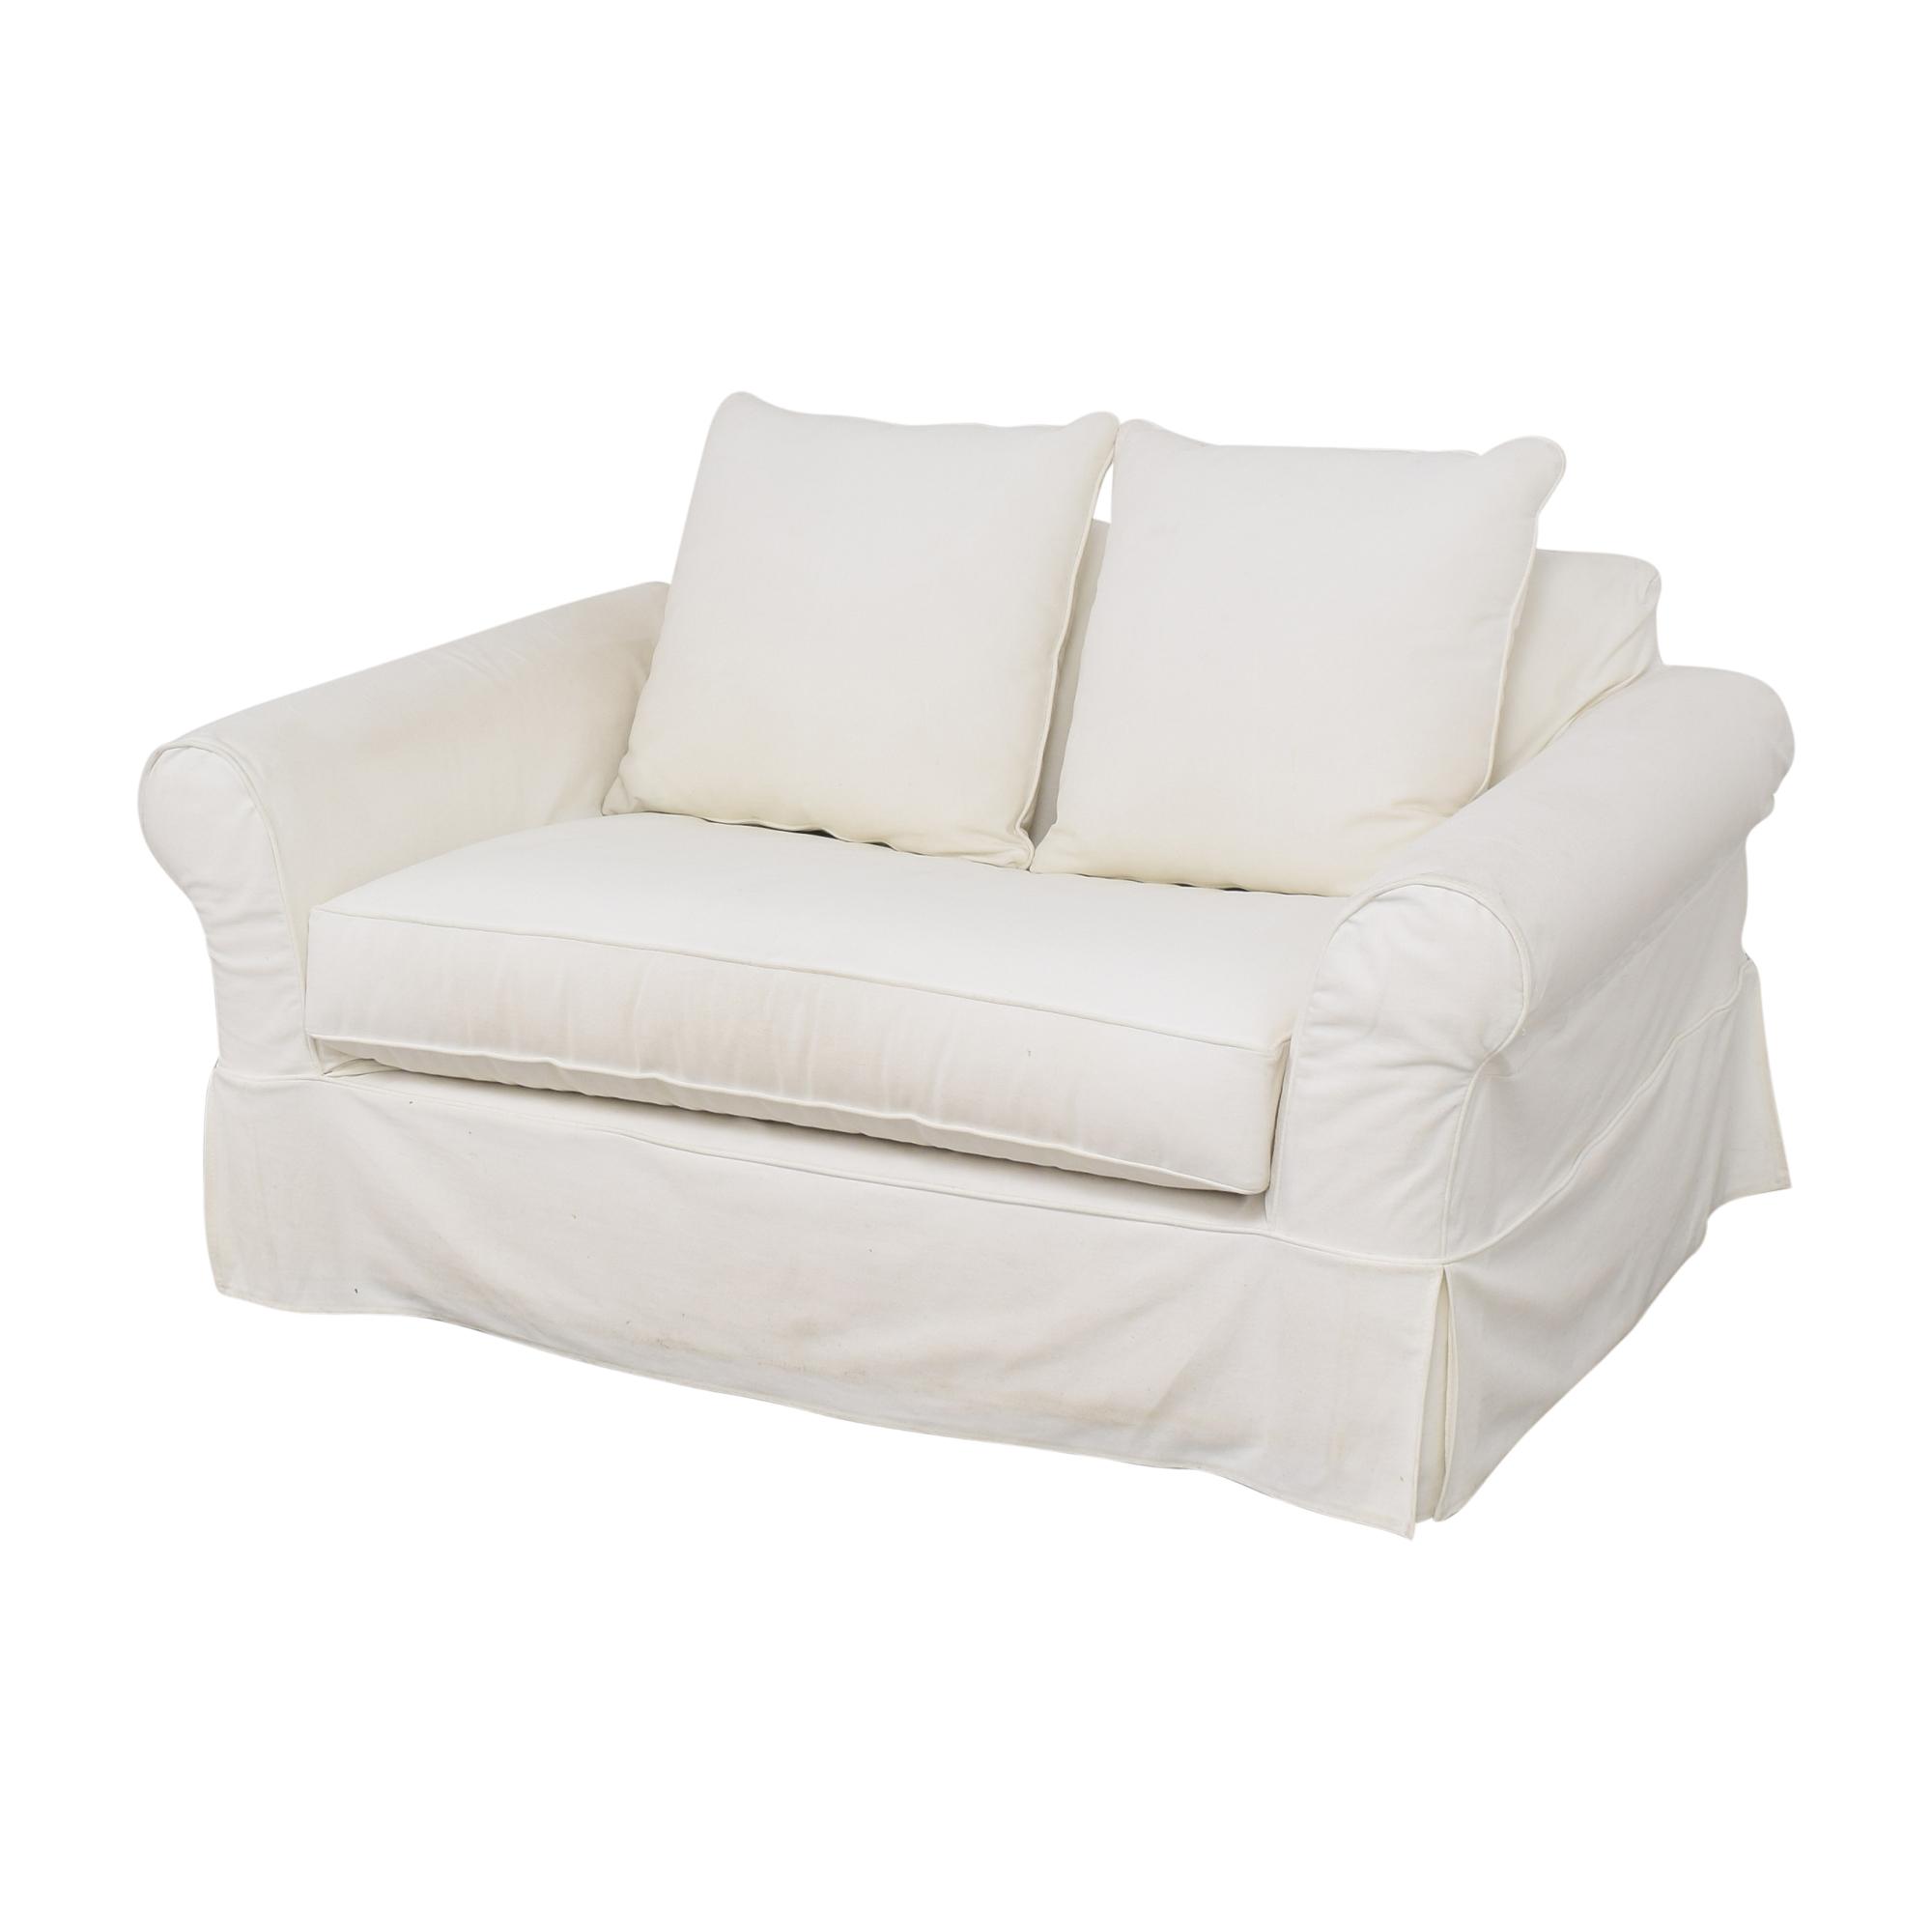 Pottery Barn Pottery Barn Comfort Roll Arm Twin Sleeper Chair price